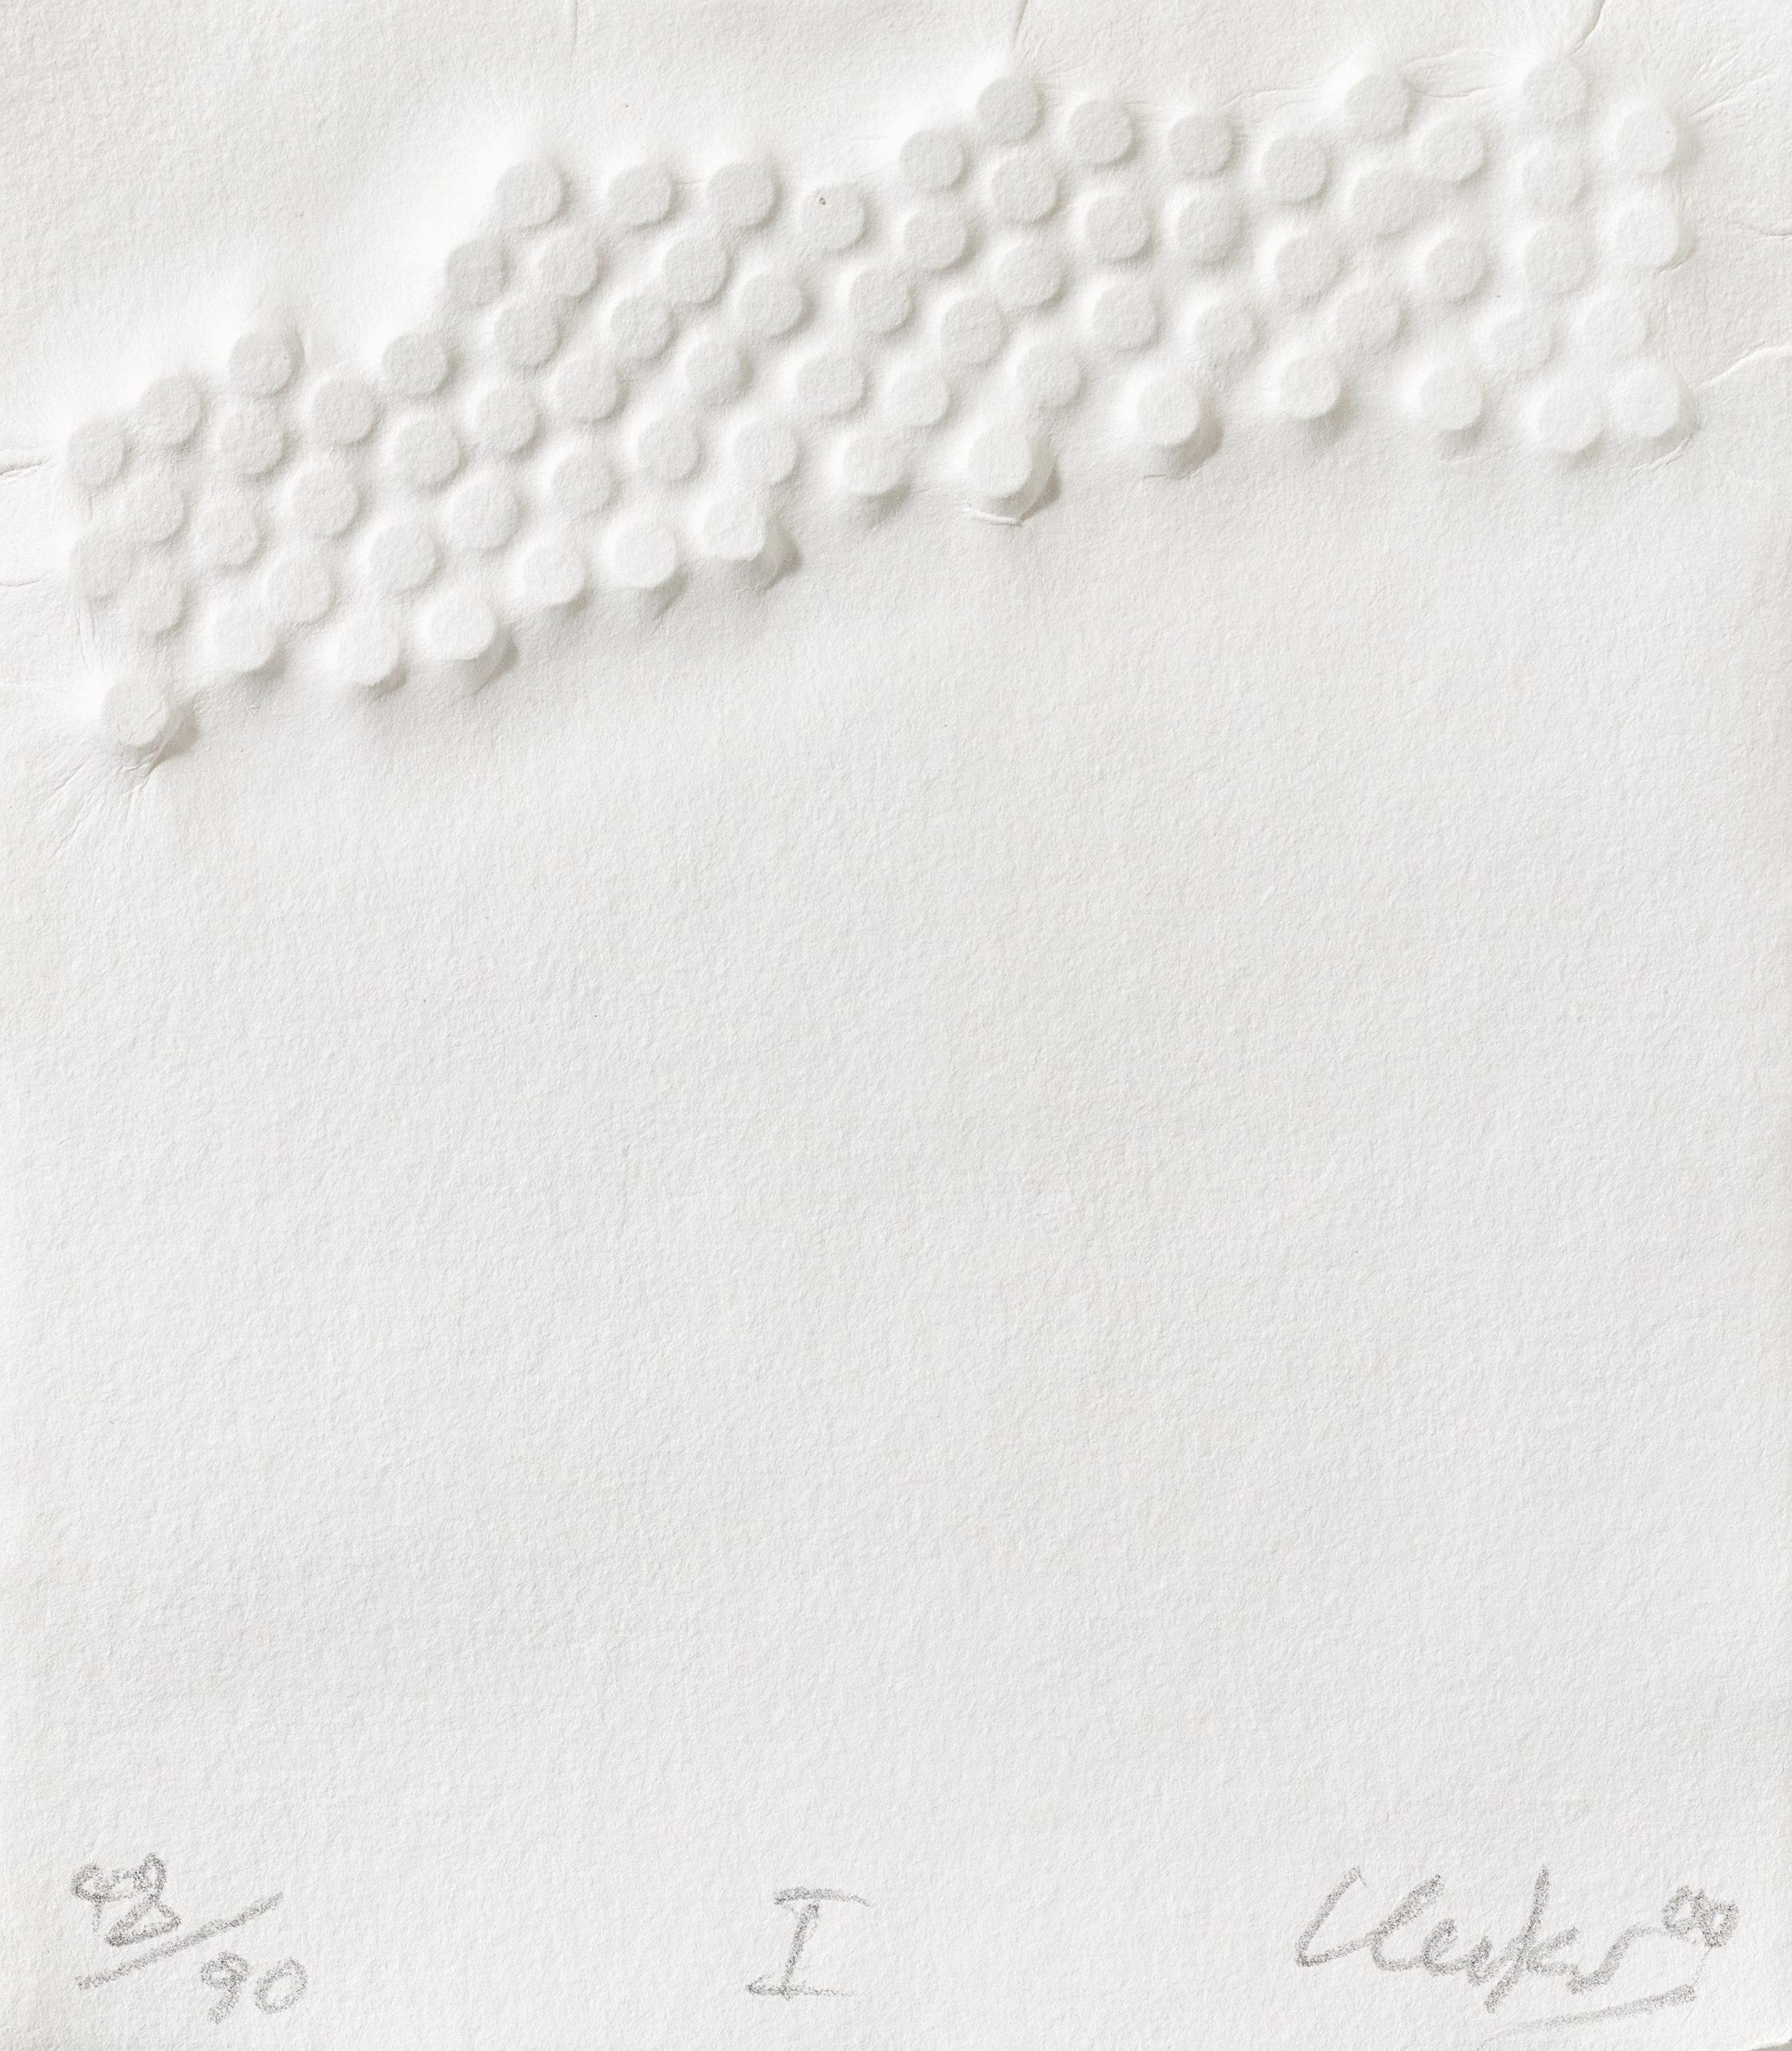 Galerie Maulberger Günter Uecker (2000)